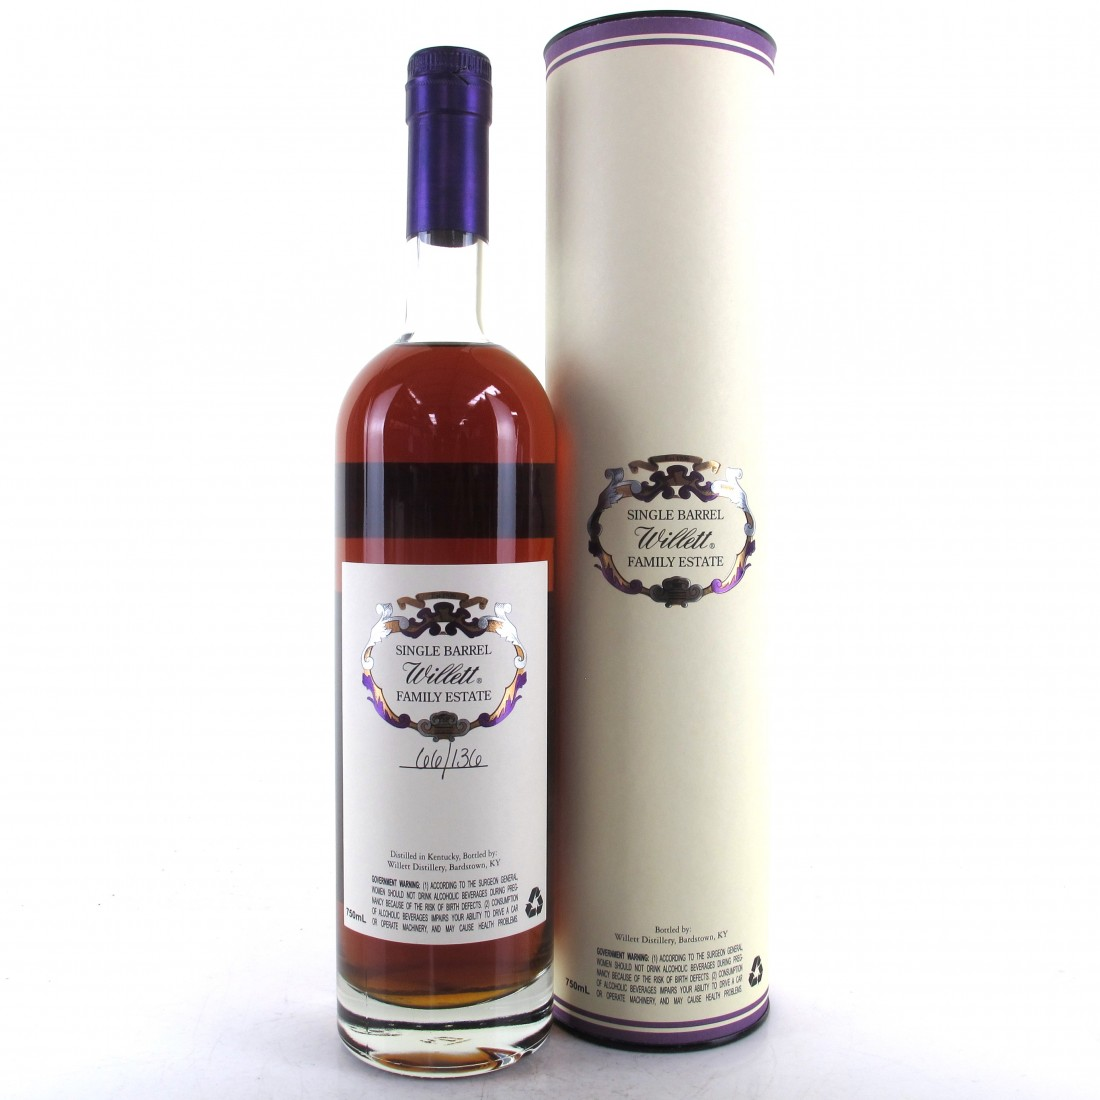 Willett Family Estate 13 Year Old Single Barrel Bourbon #1335